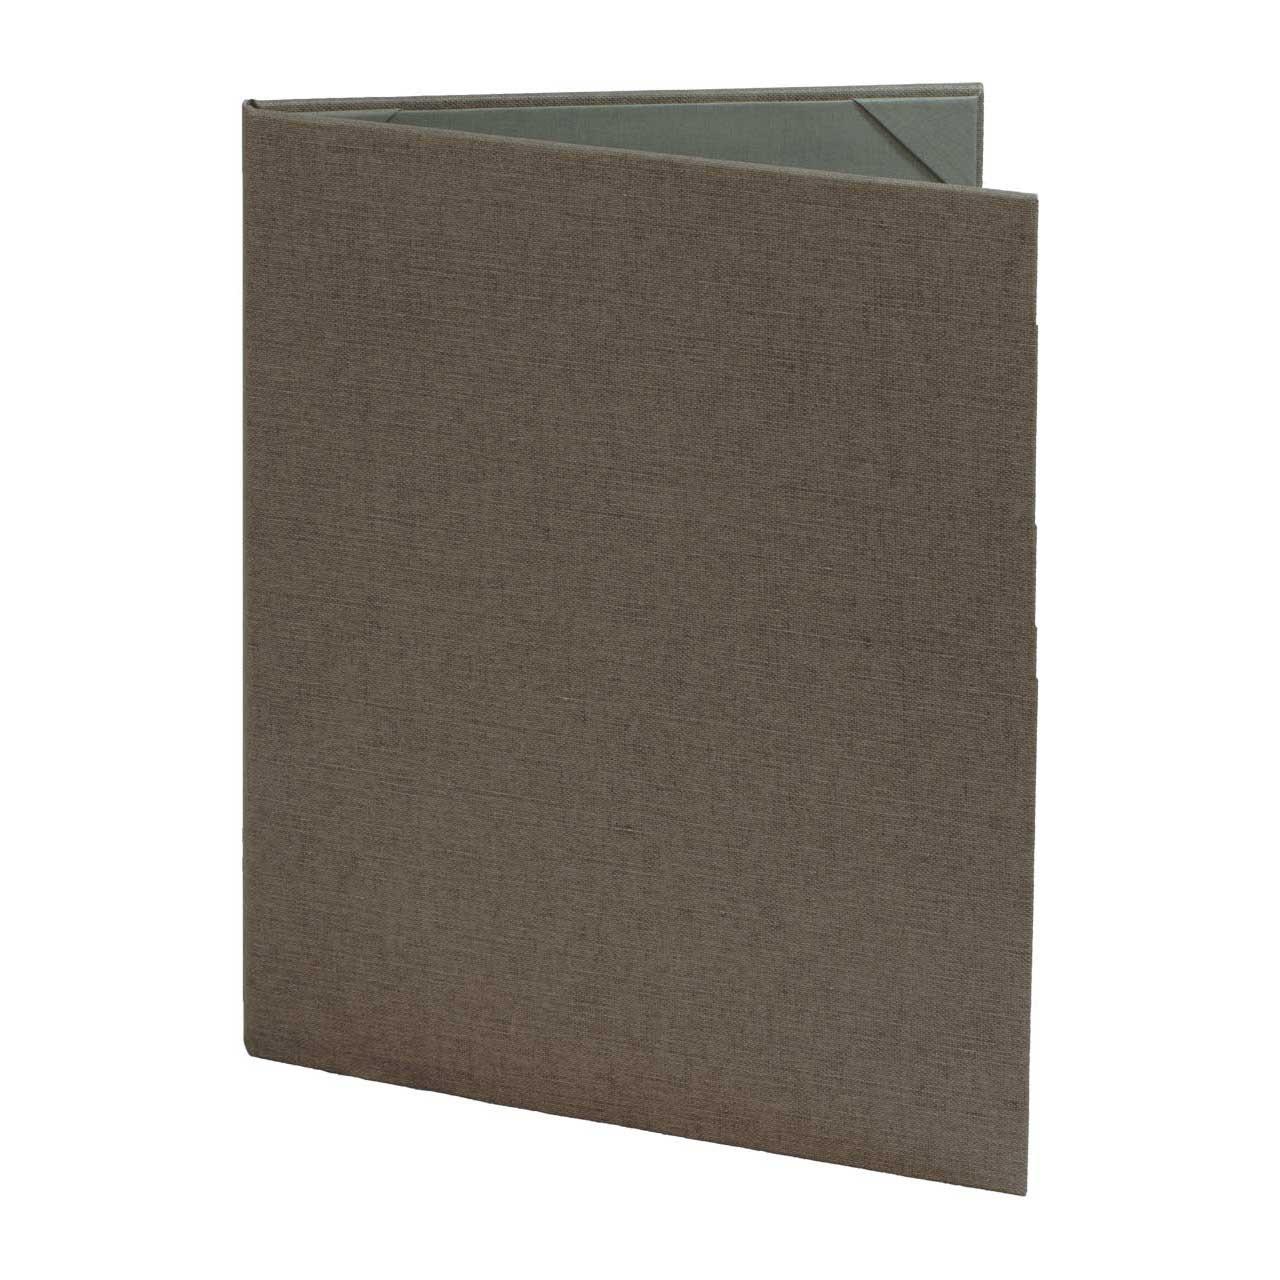 8 1/2 x 11 Insert, 2-Panel Menu Cover (Gray)